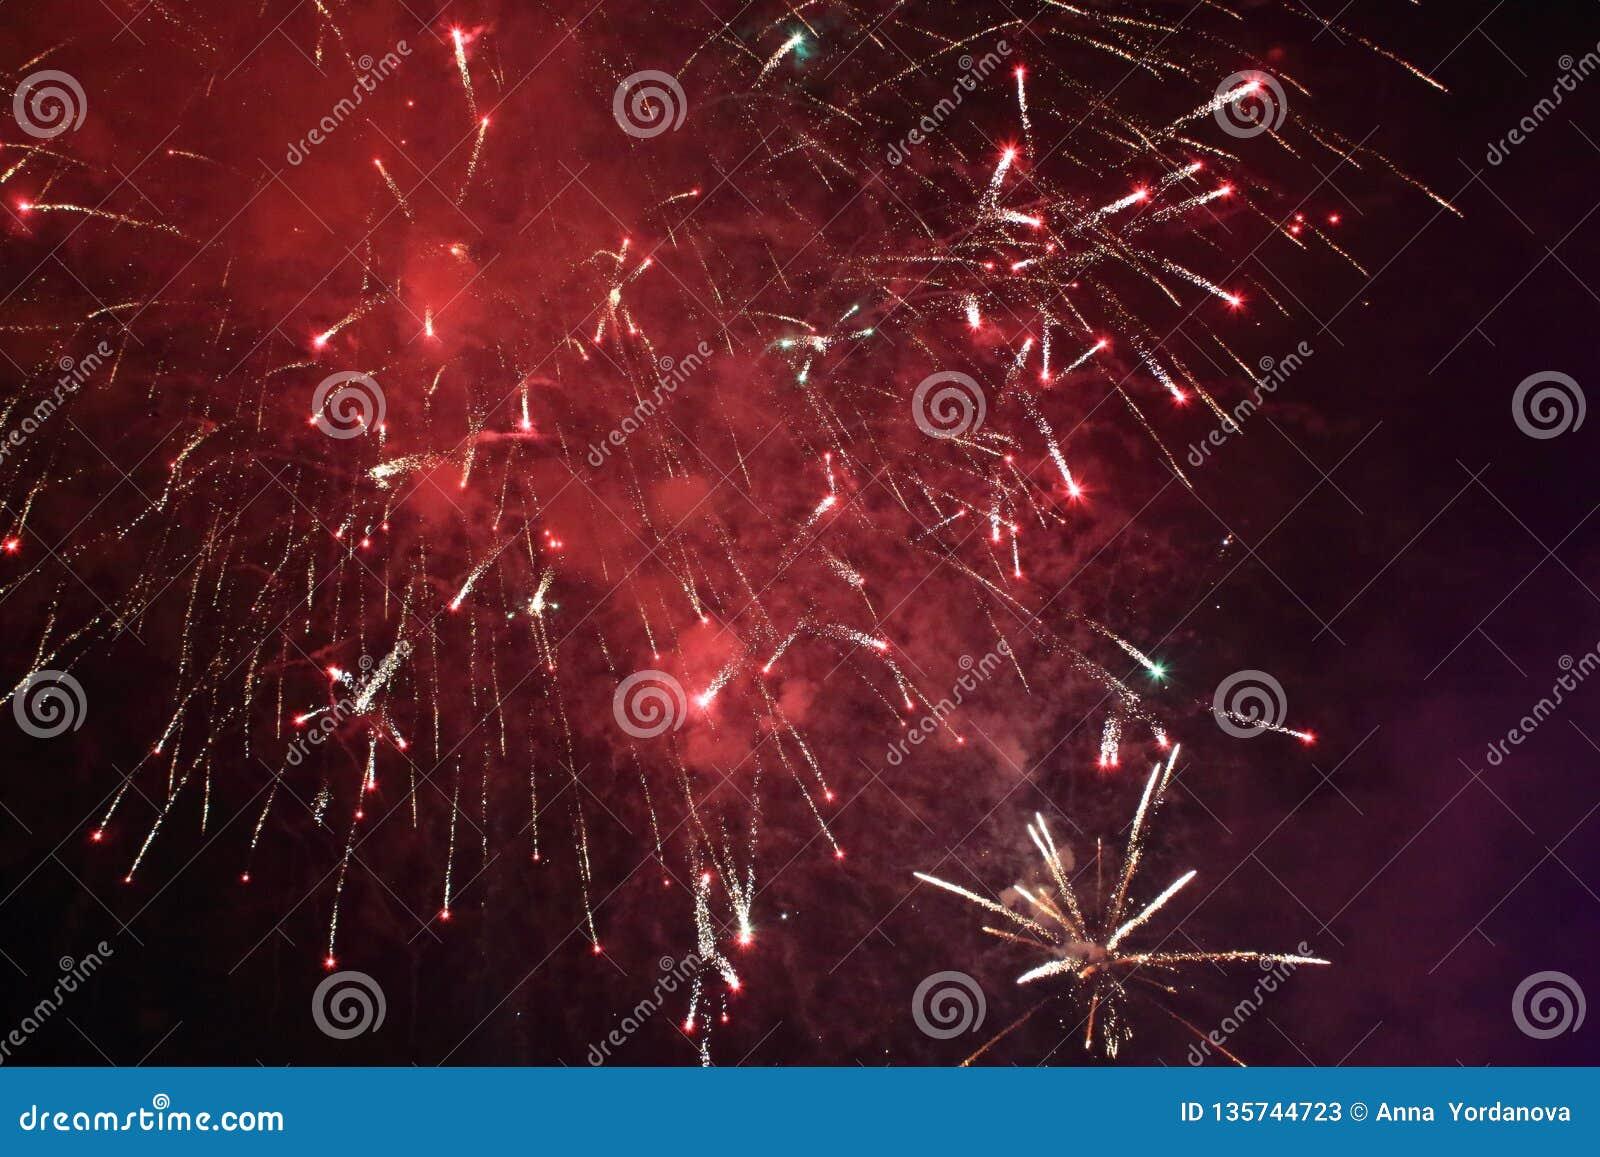 Red Illuminations Lights On Black Night Sky Background Stock Image